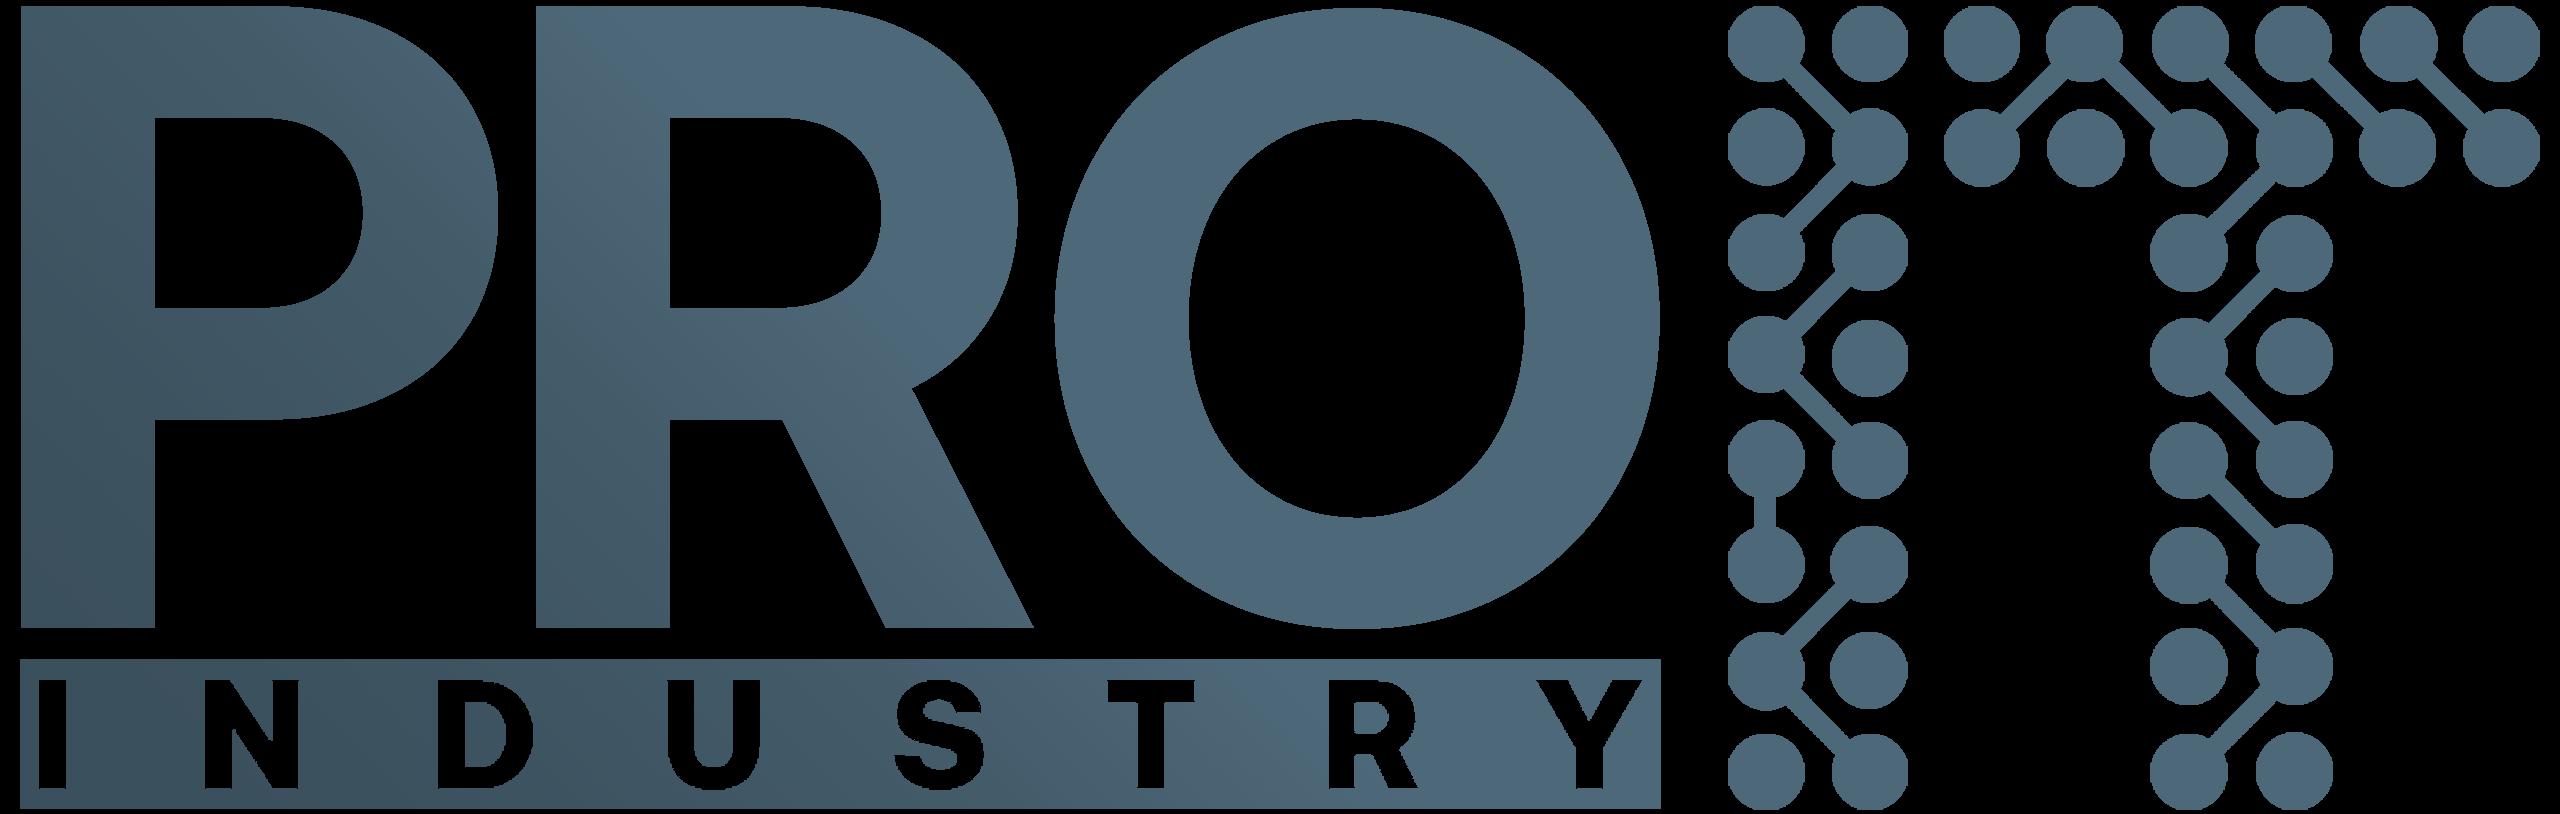 pro it logo mare petrol